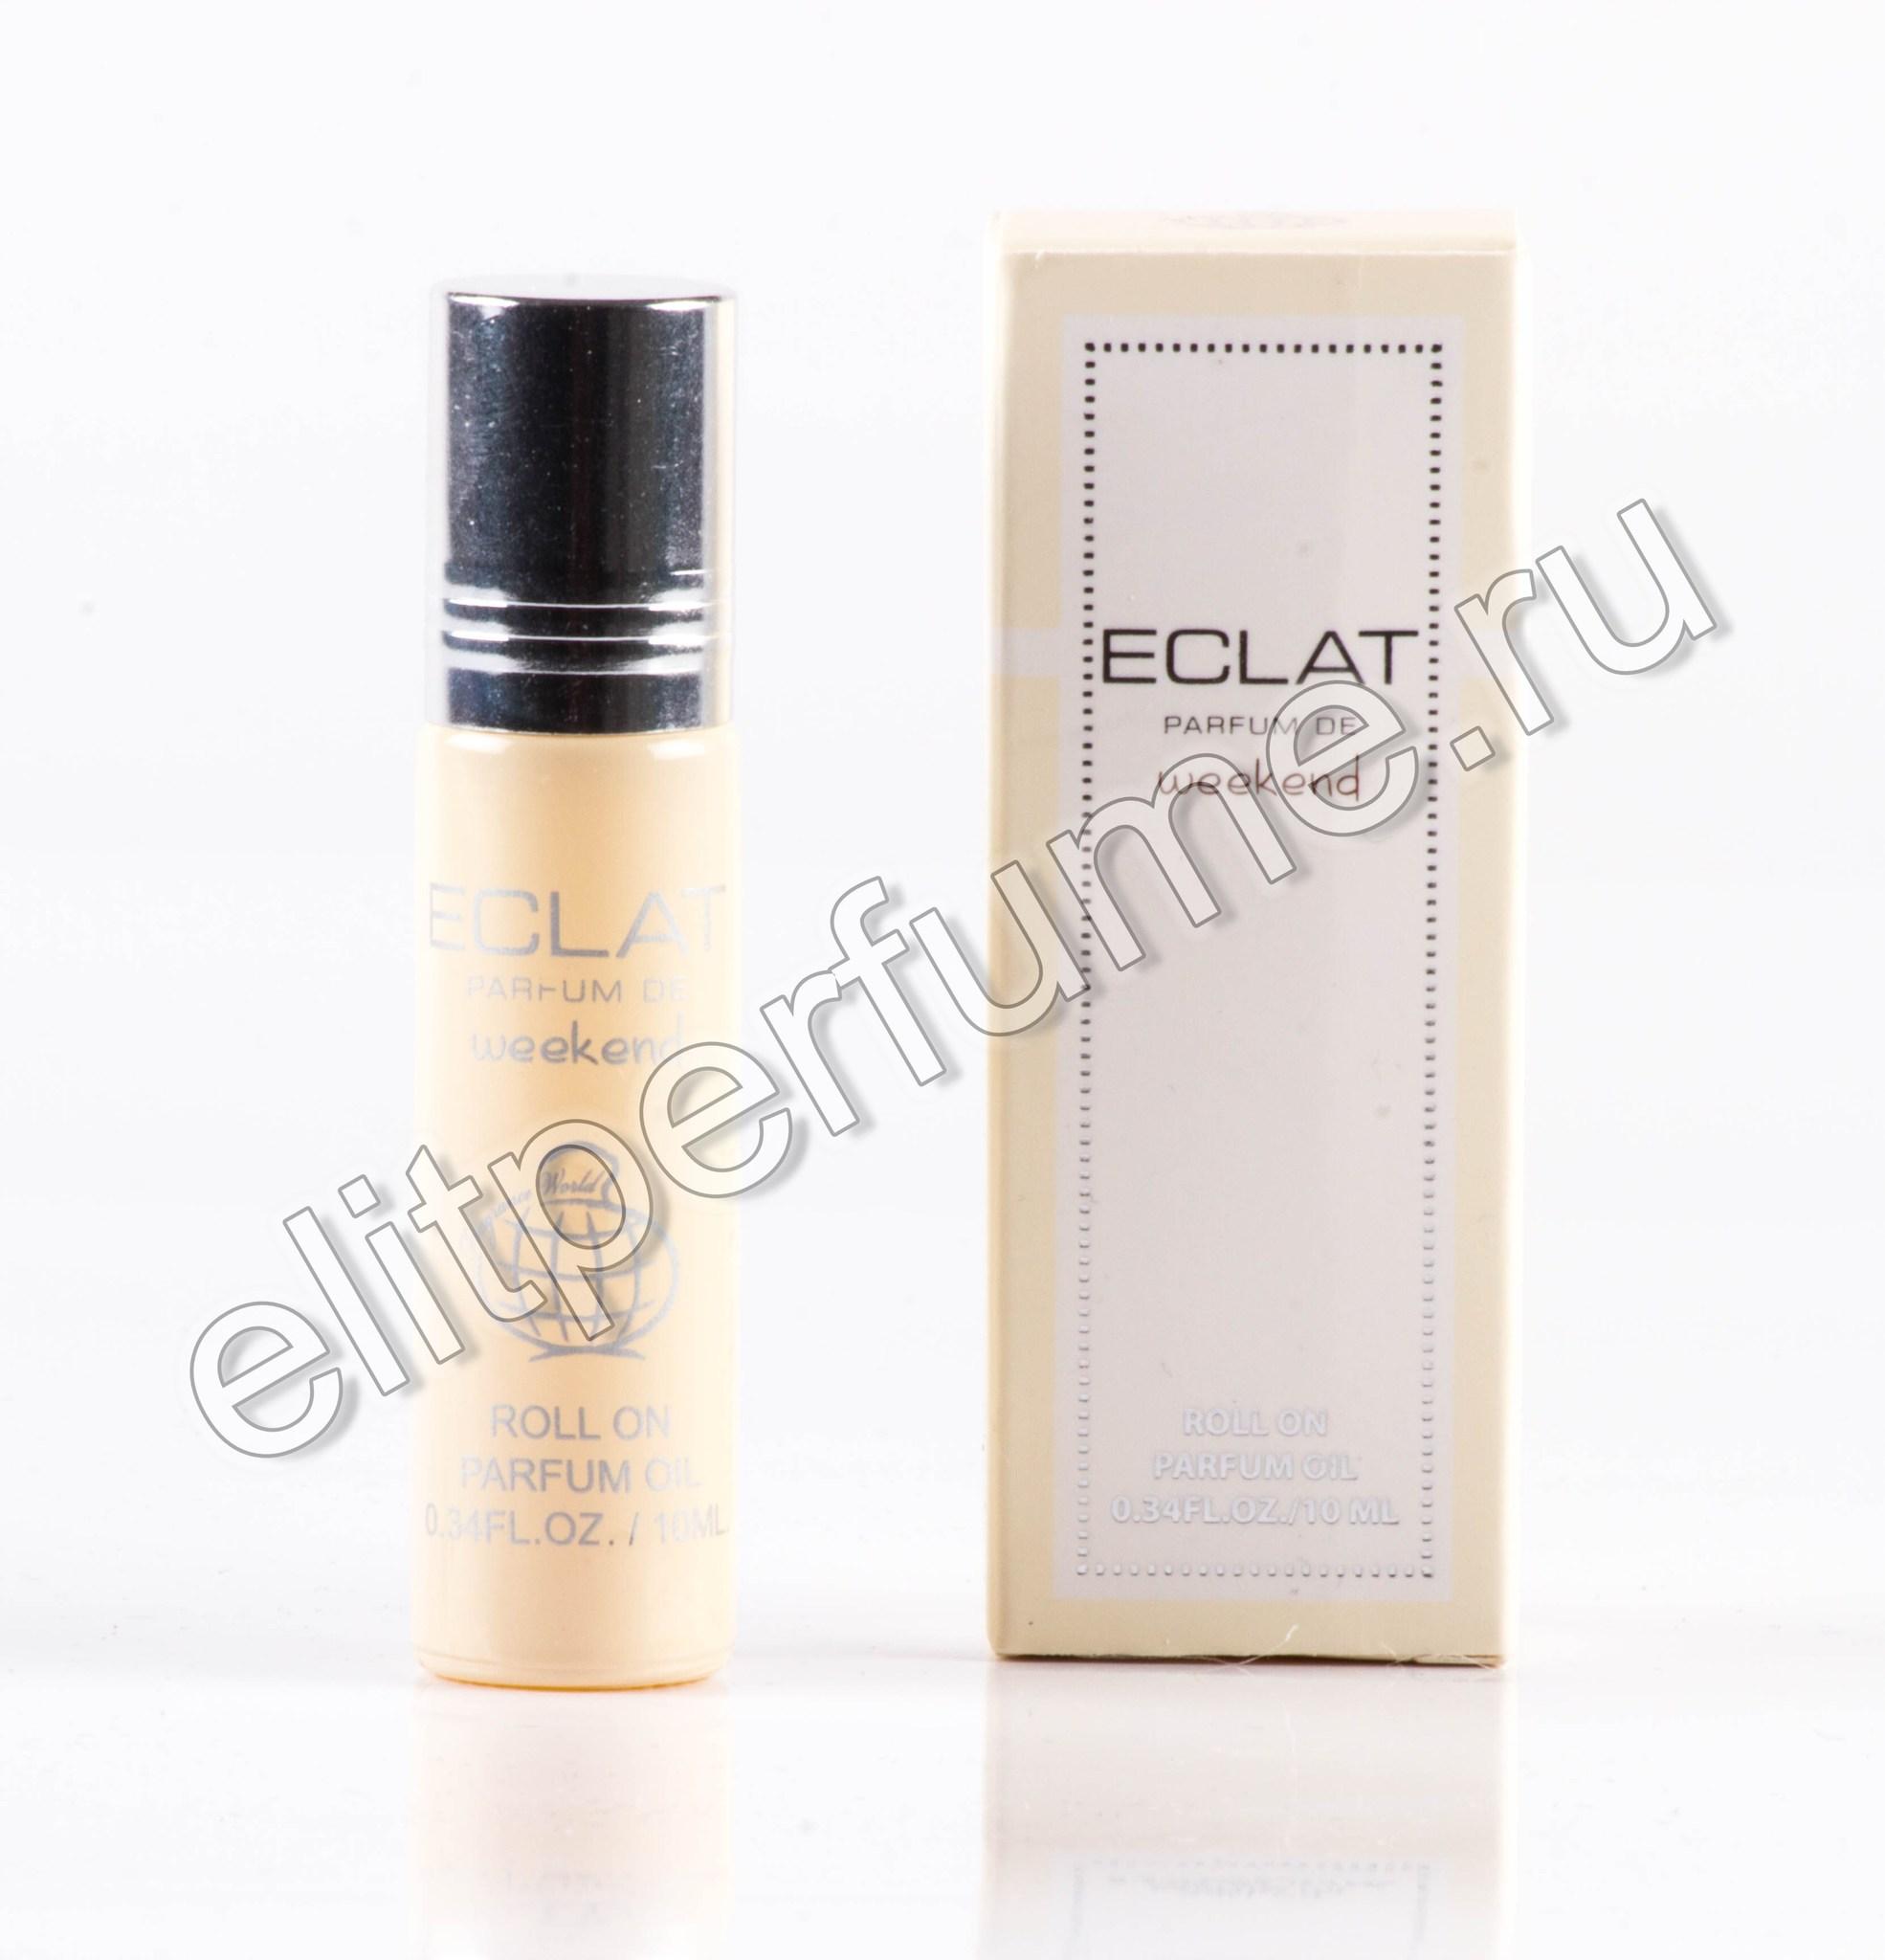 Eclat weekend 10 мл арабские масляные духи от Фрагранс Ворлд Fragrance world